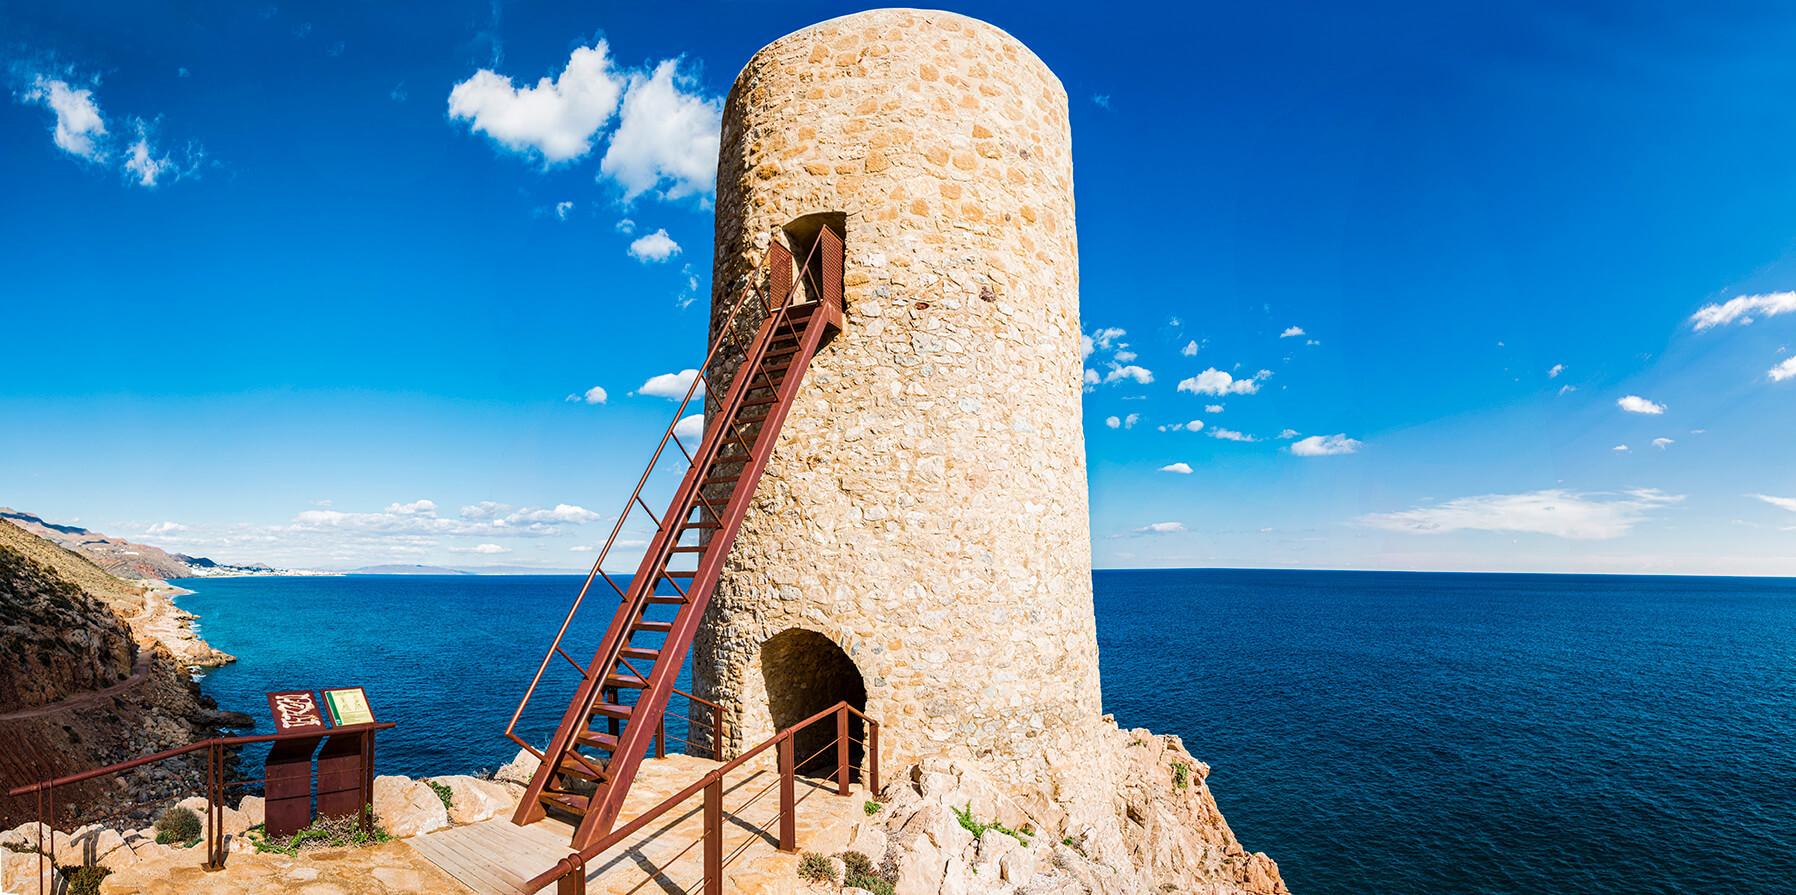 torre pirulin.jpg